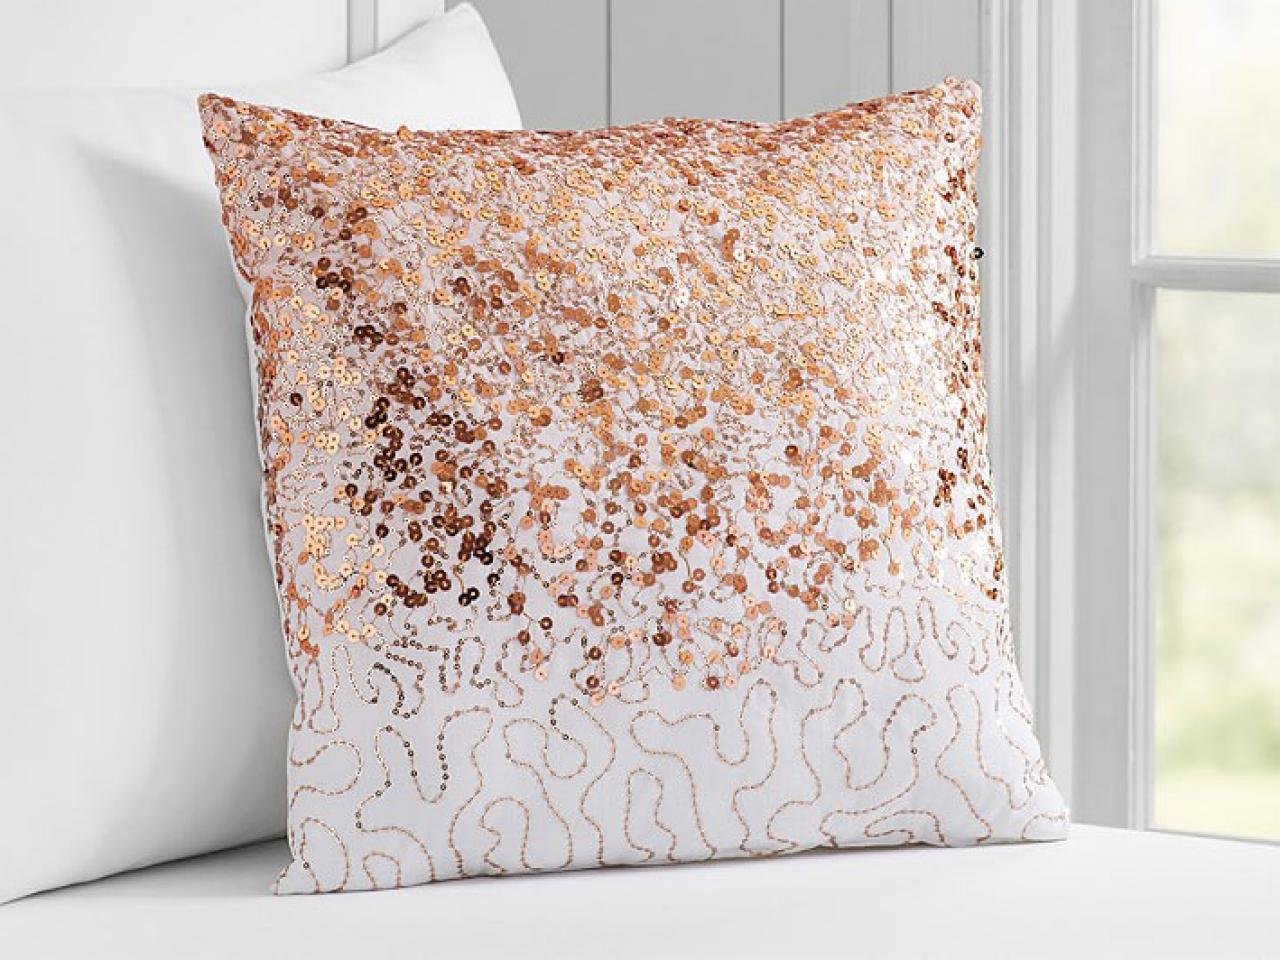 Rose Gold Bedroom Decorating Ideas  HGTVs Decorating  Design Blog  HGTV